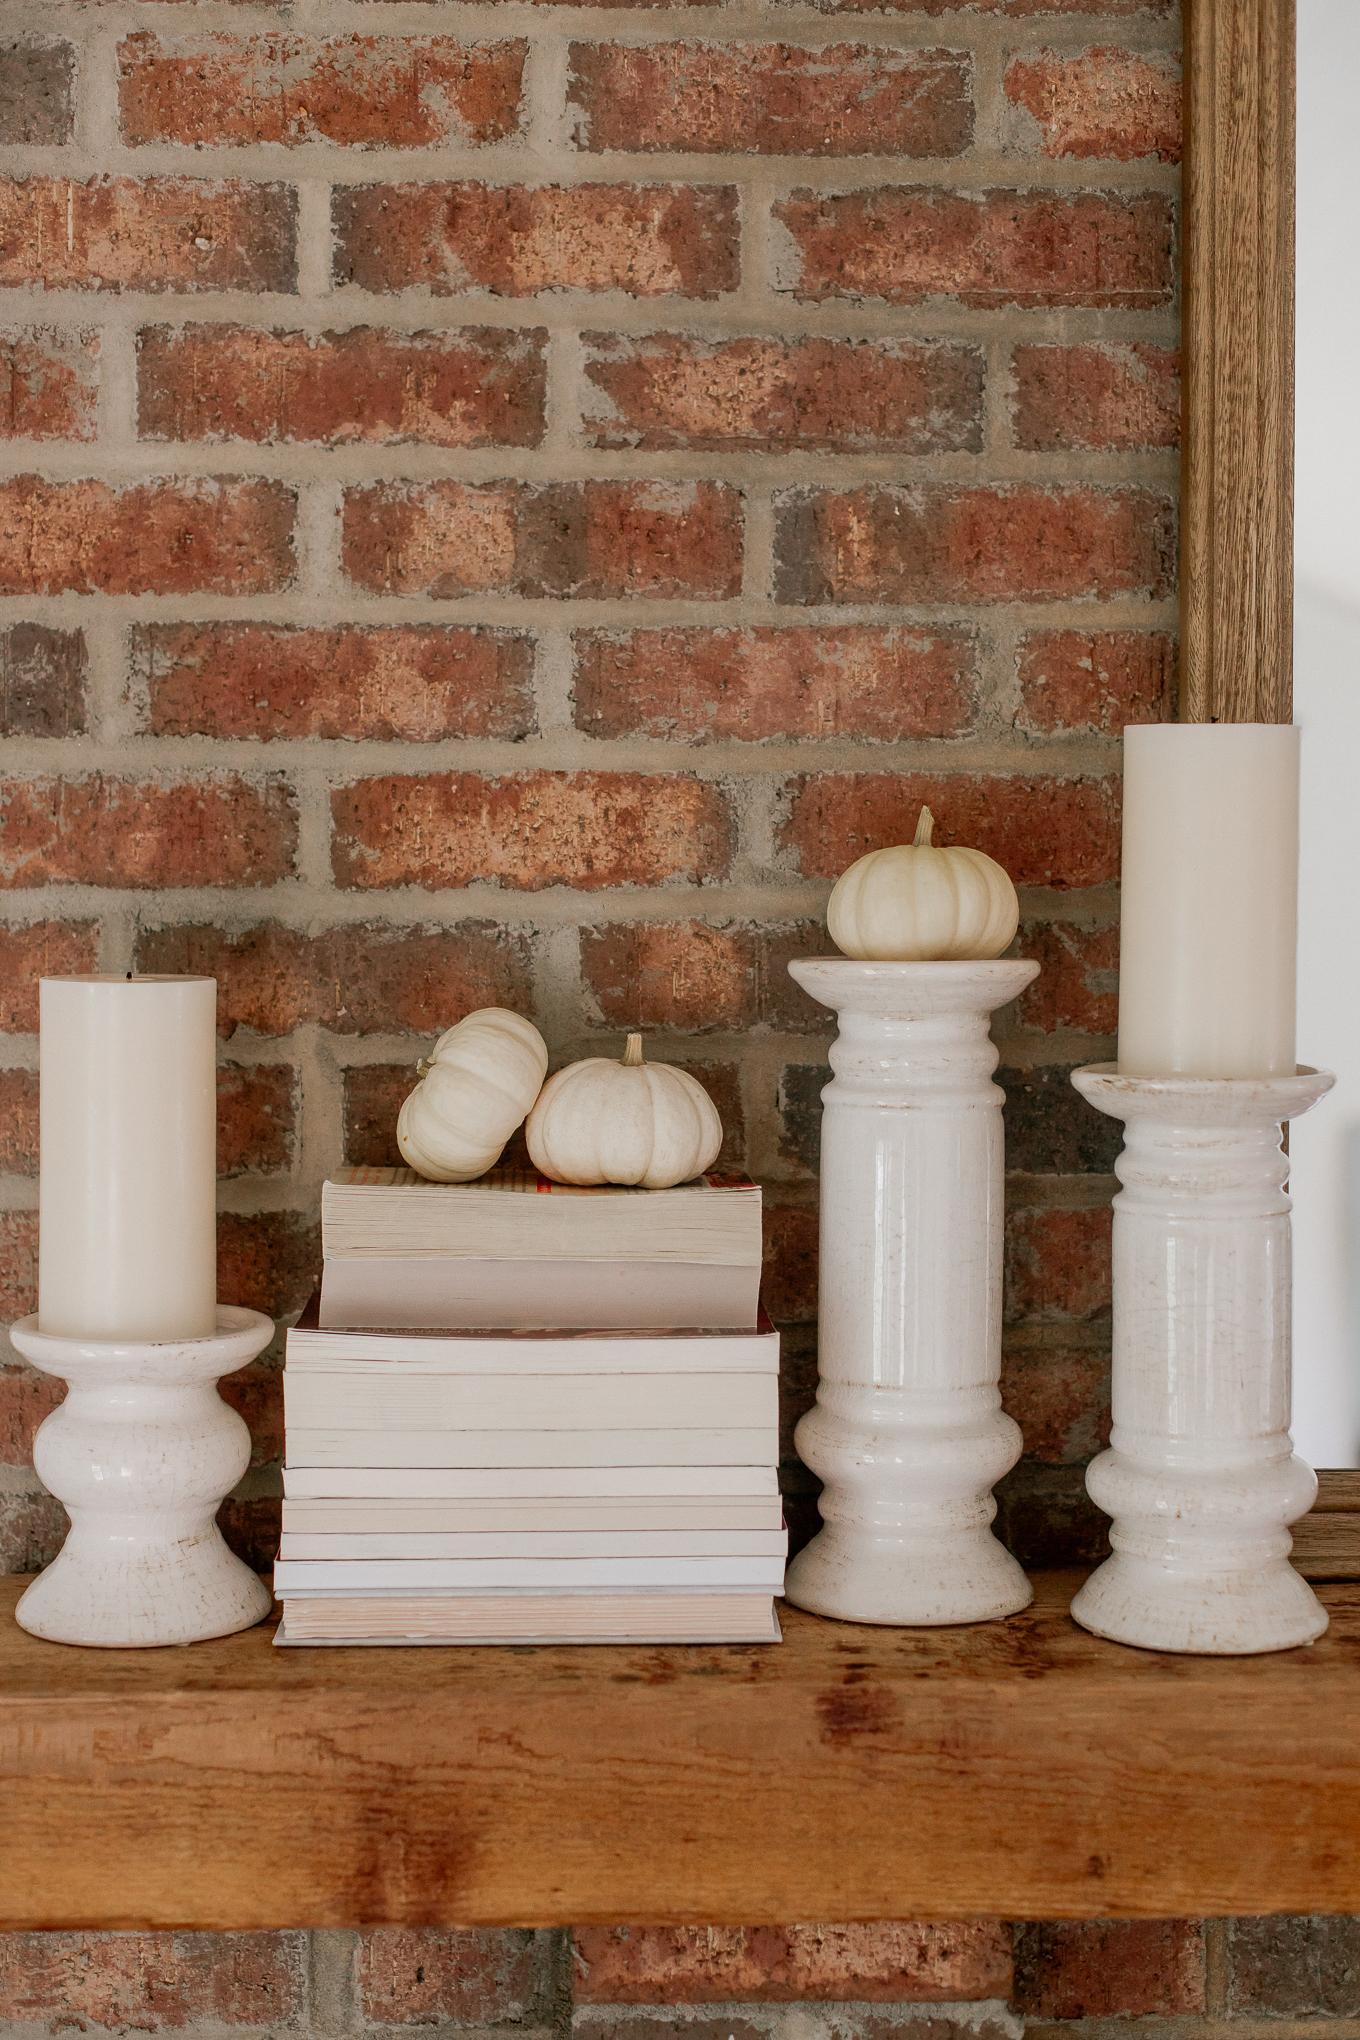 Mantle Candlesticks, Mini Pumpkins | Louella Reese